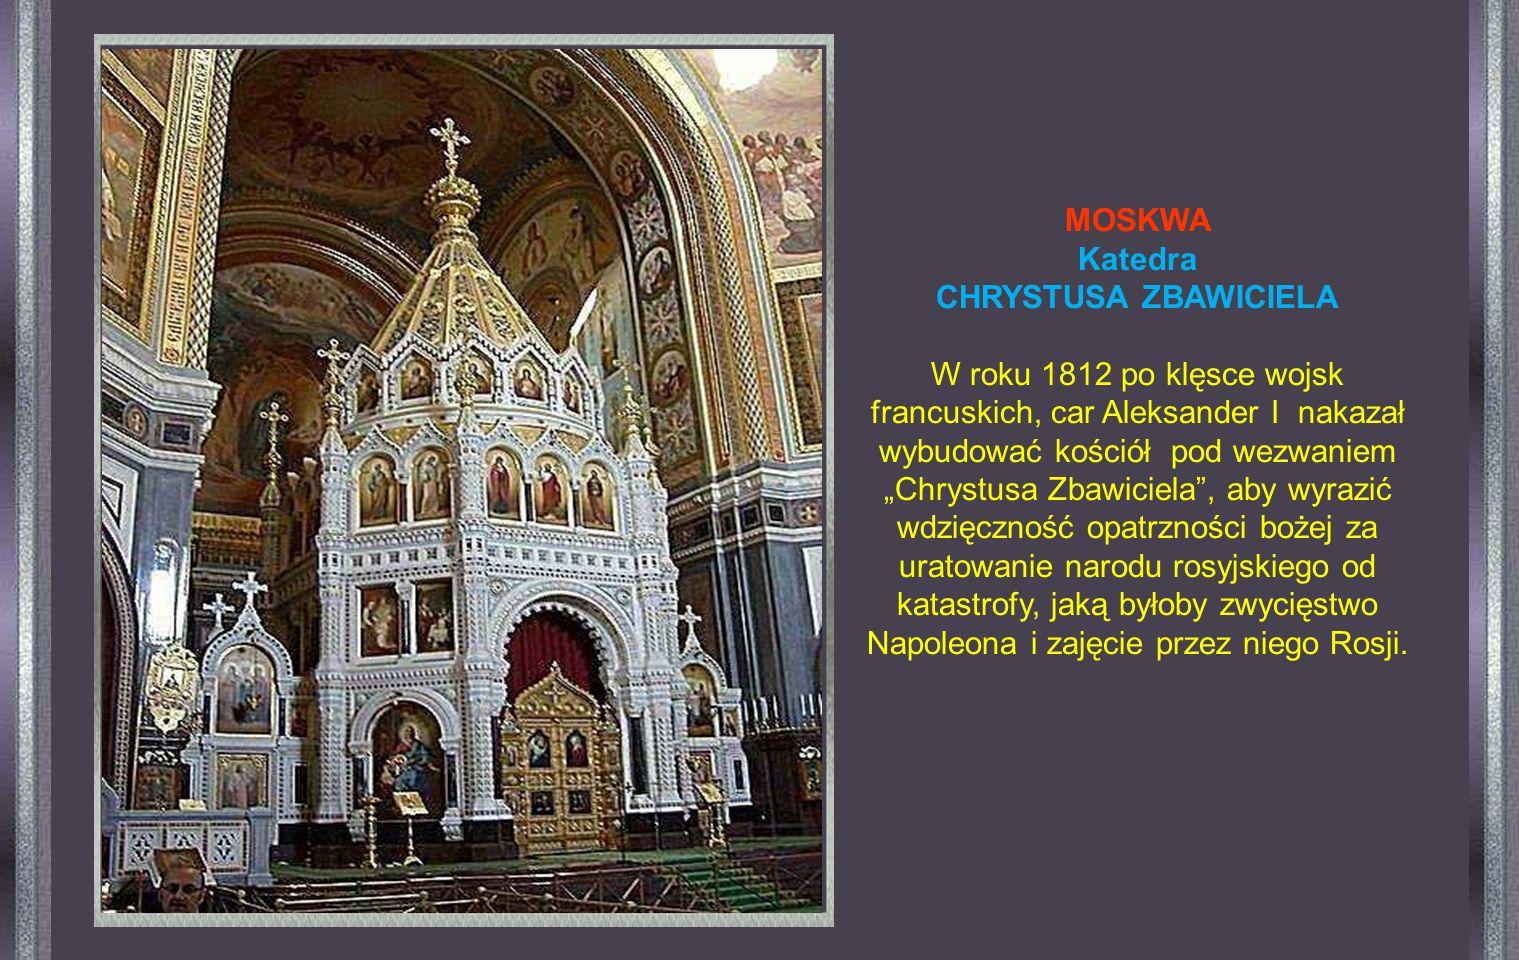 MOSKWA Katedra. CHRYSTUSA ZBAWICIELA.